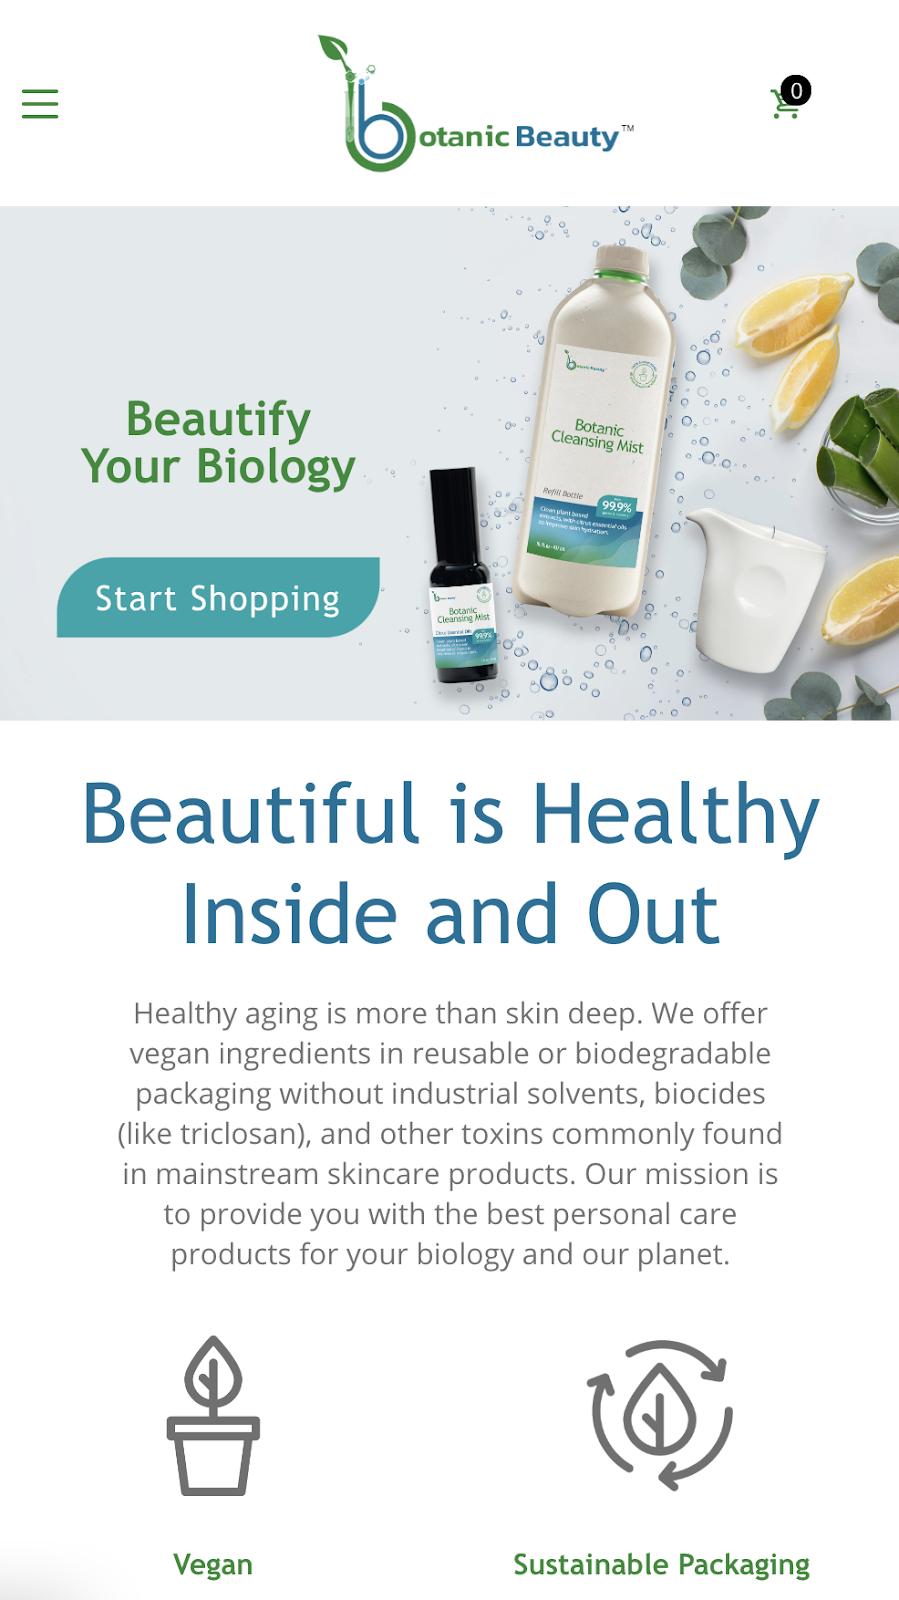 screenshot of mobile view of botanicbeauty.com